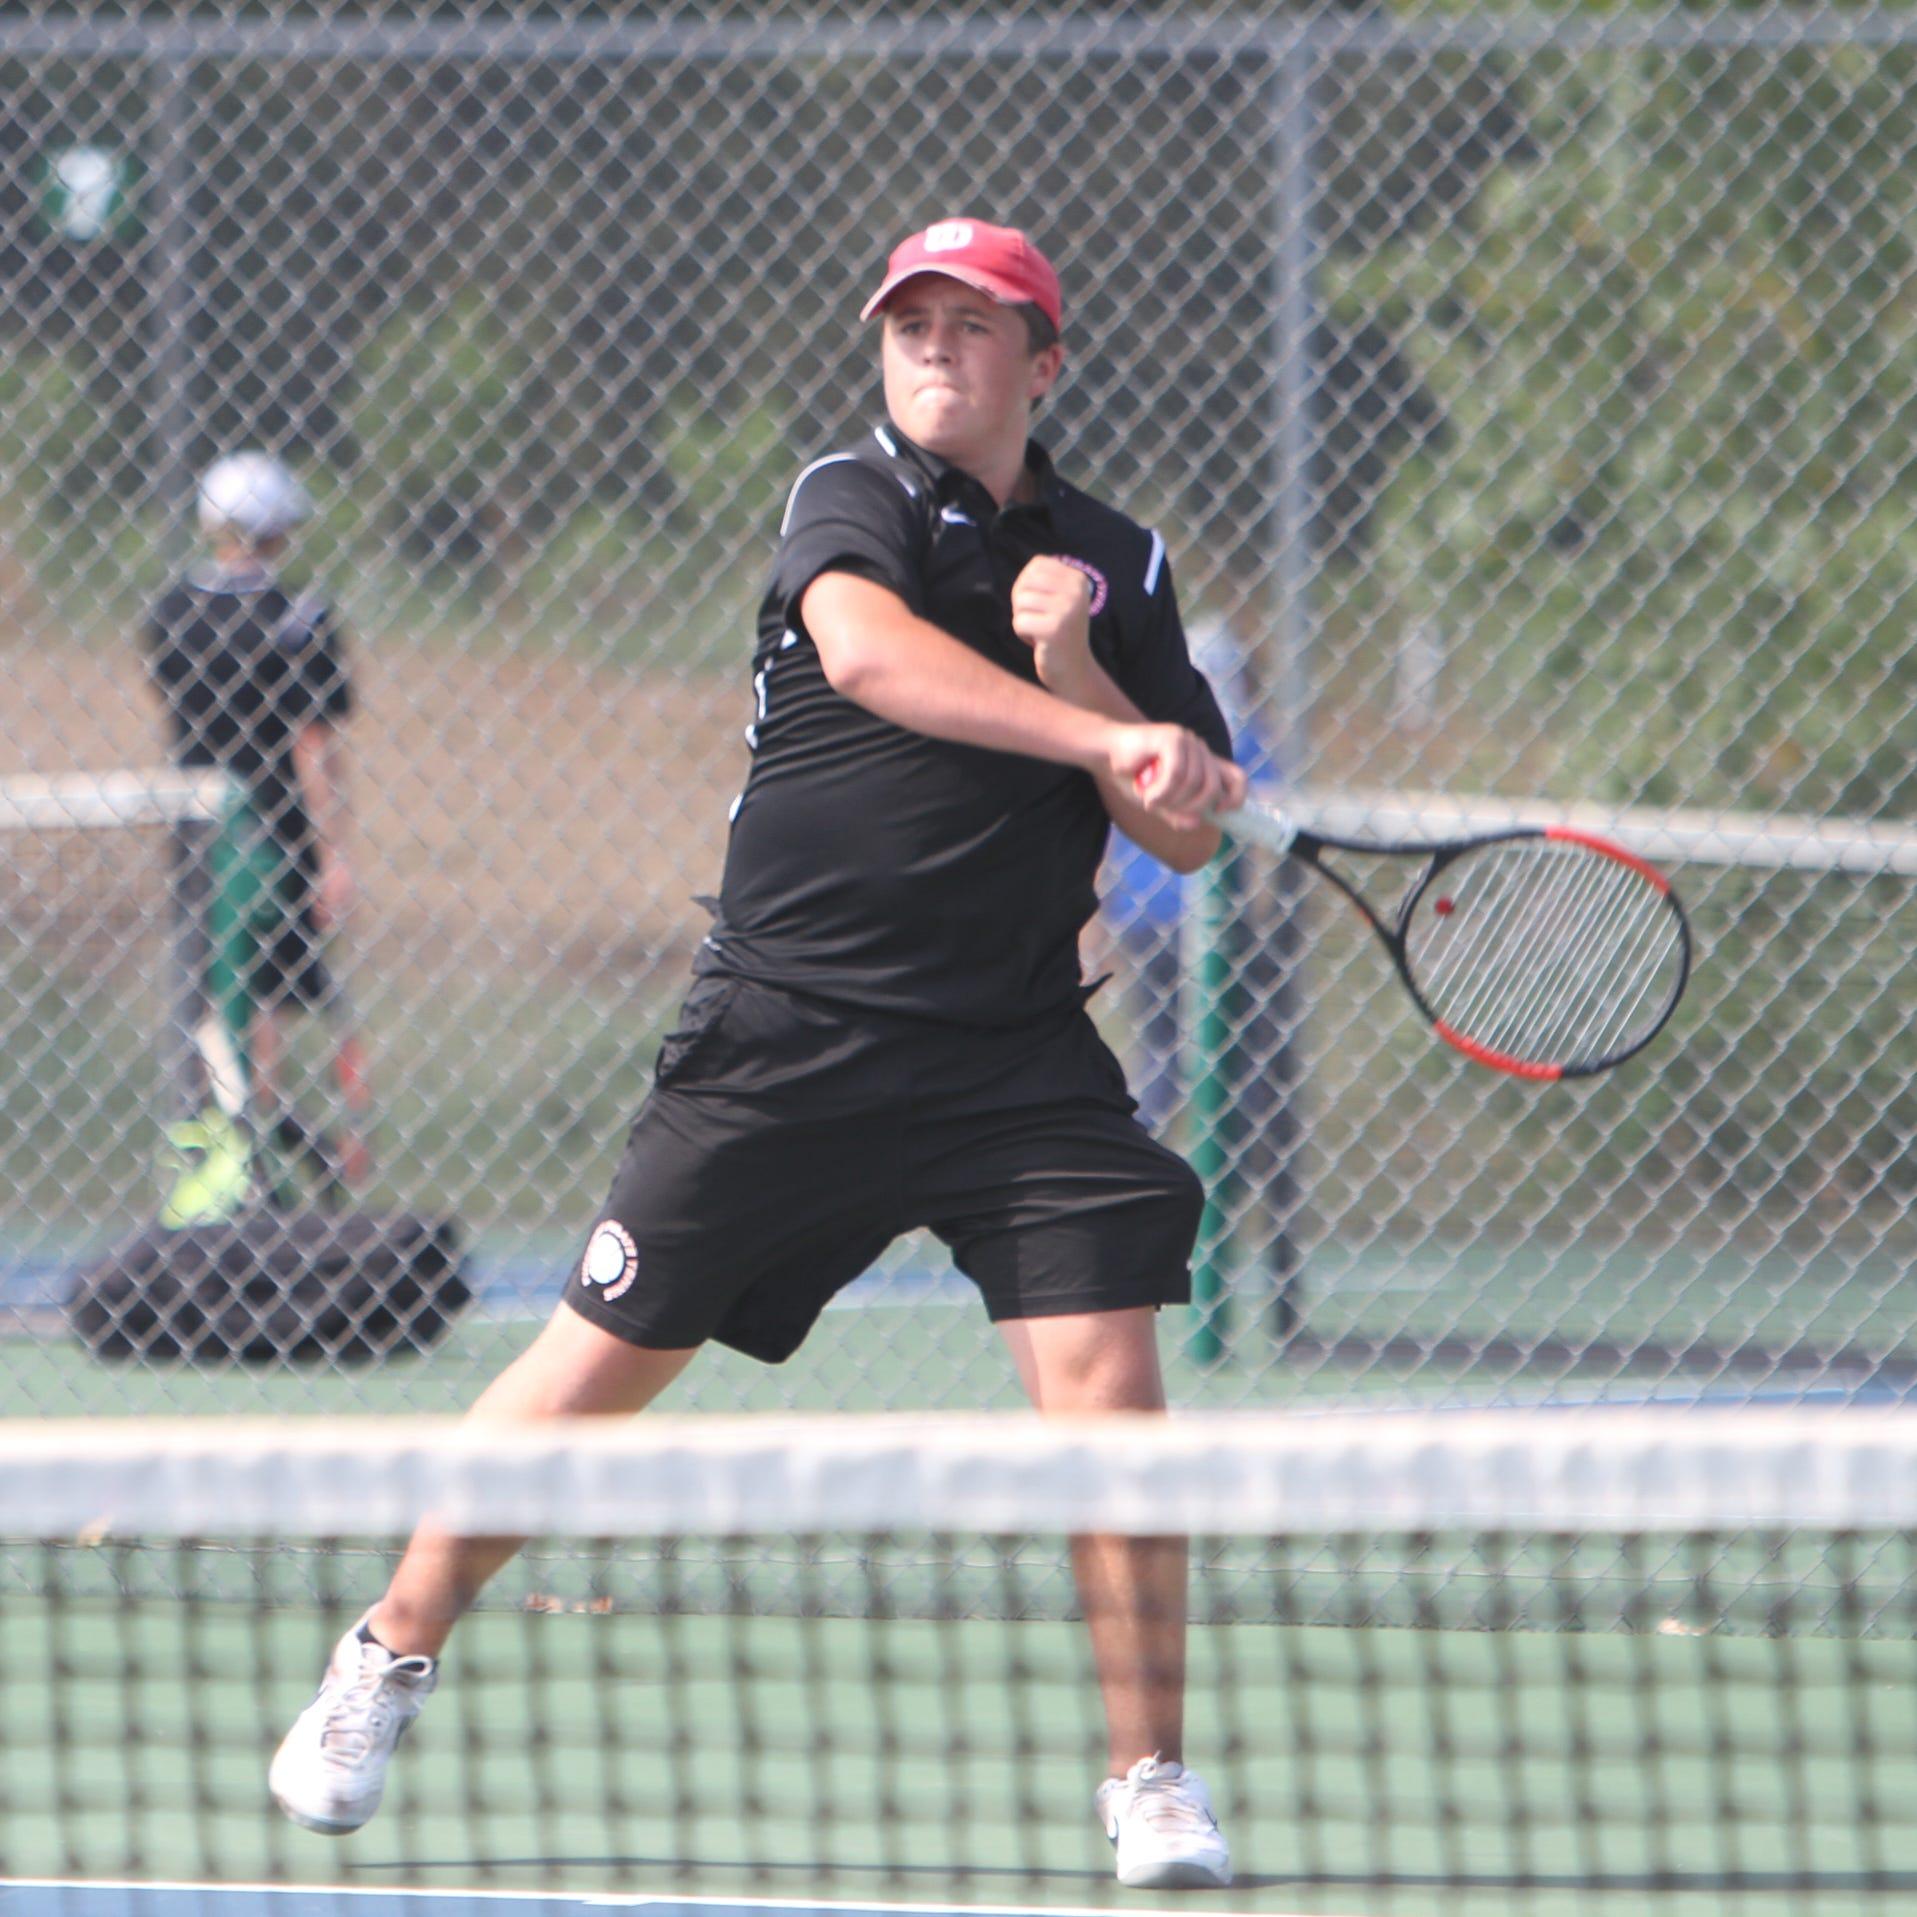 2018 All-Livingston County boys tennis team